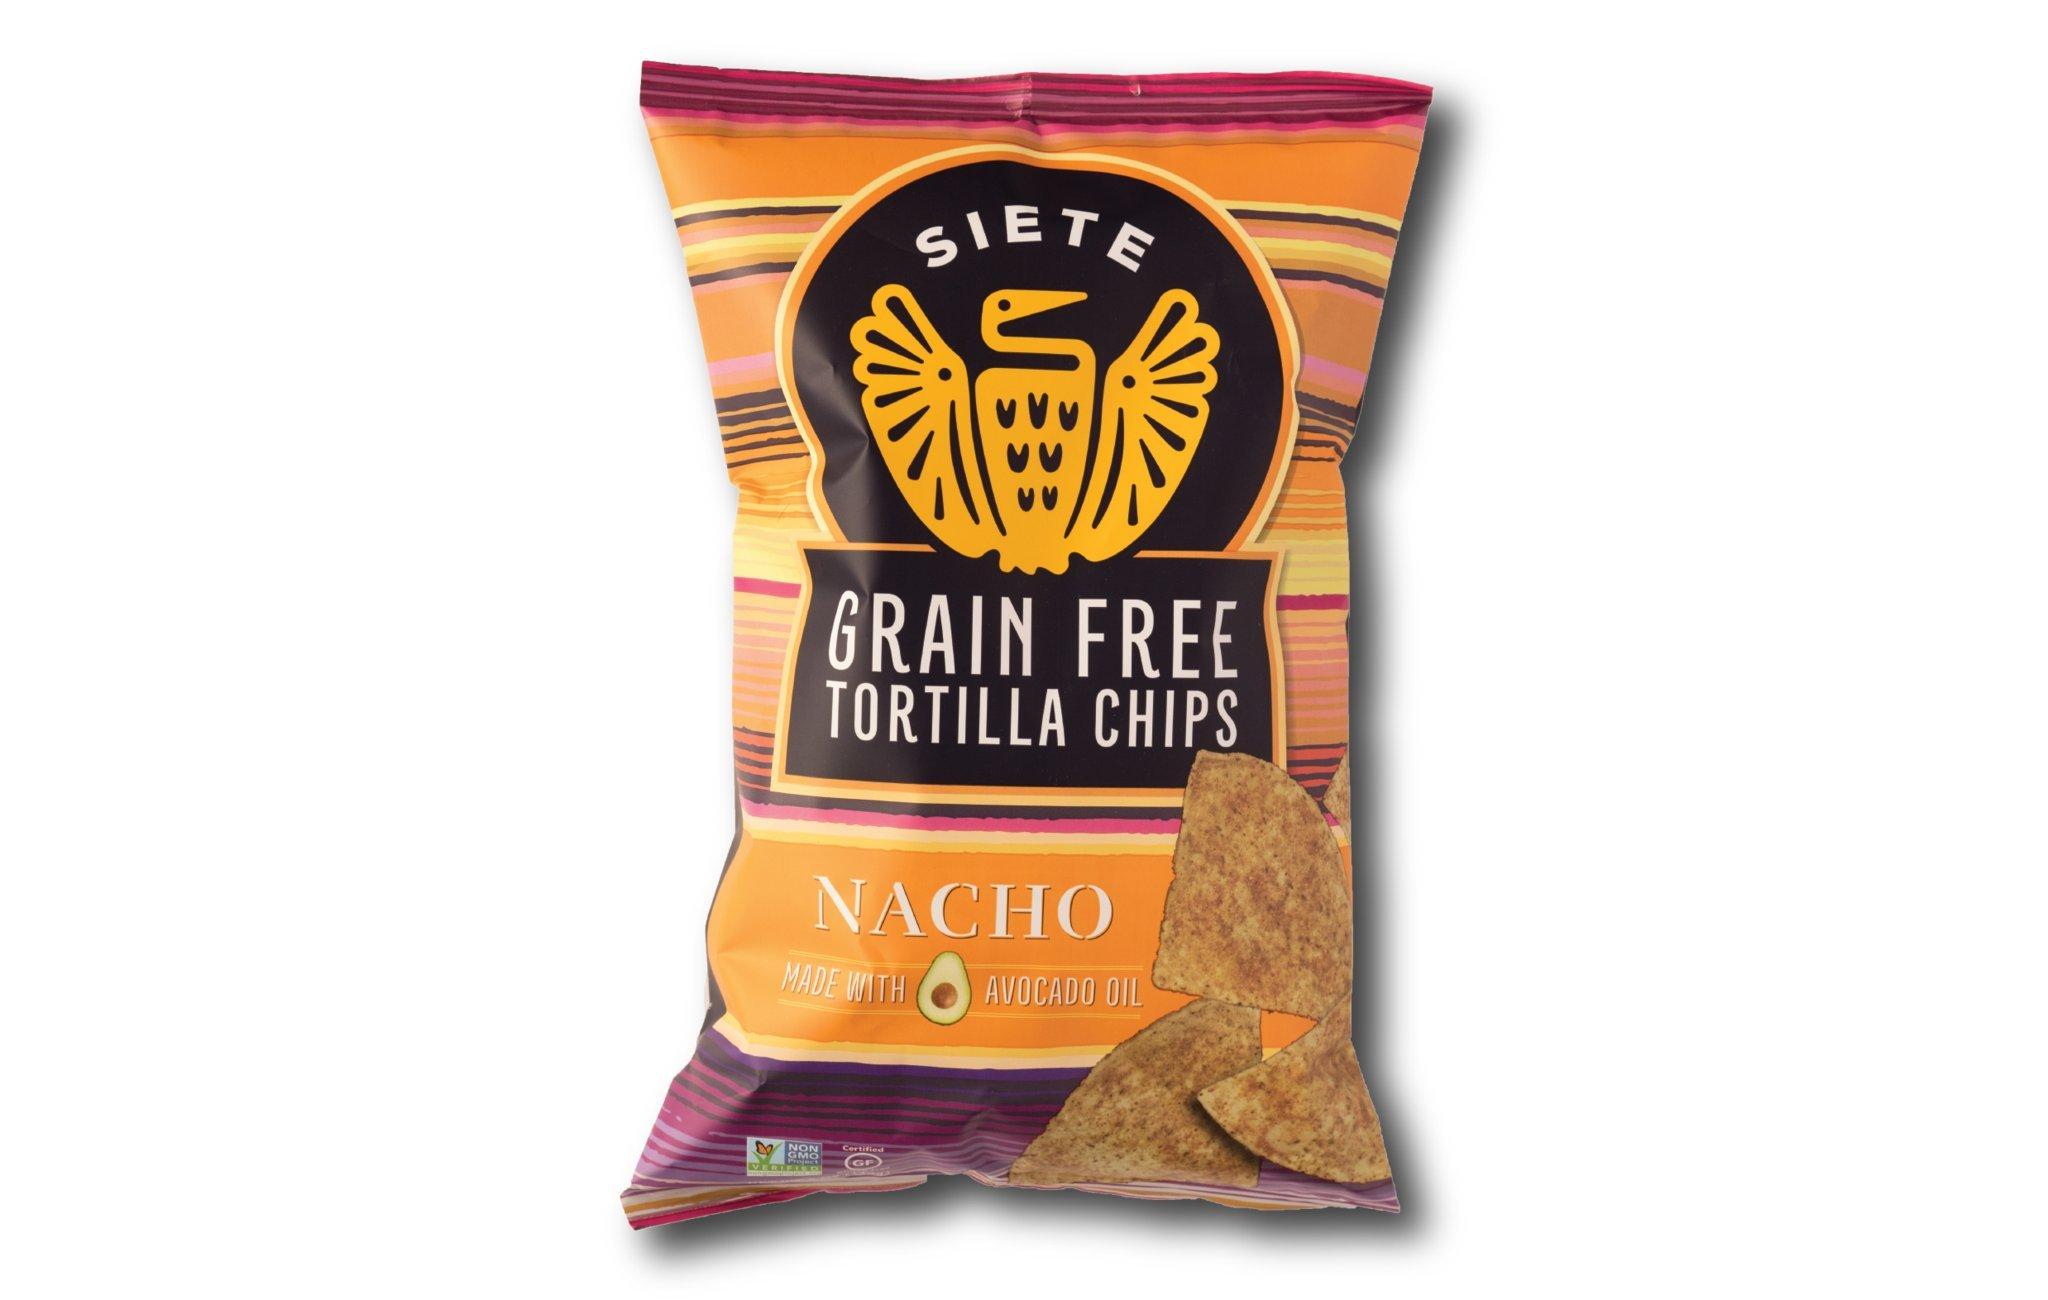 Amazon.com: Siete, Sea Salt Tortilla Chips, 5 oz